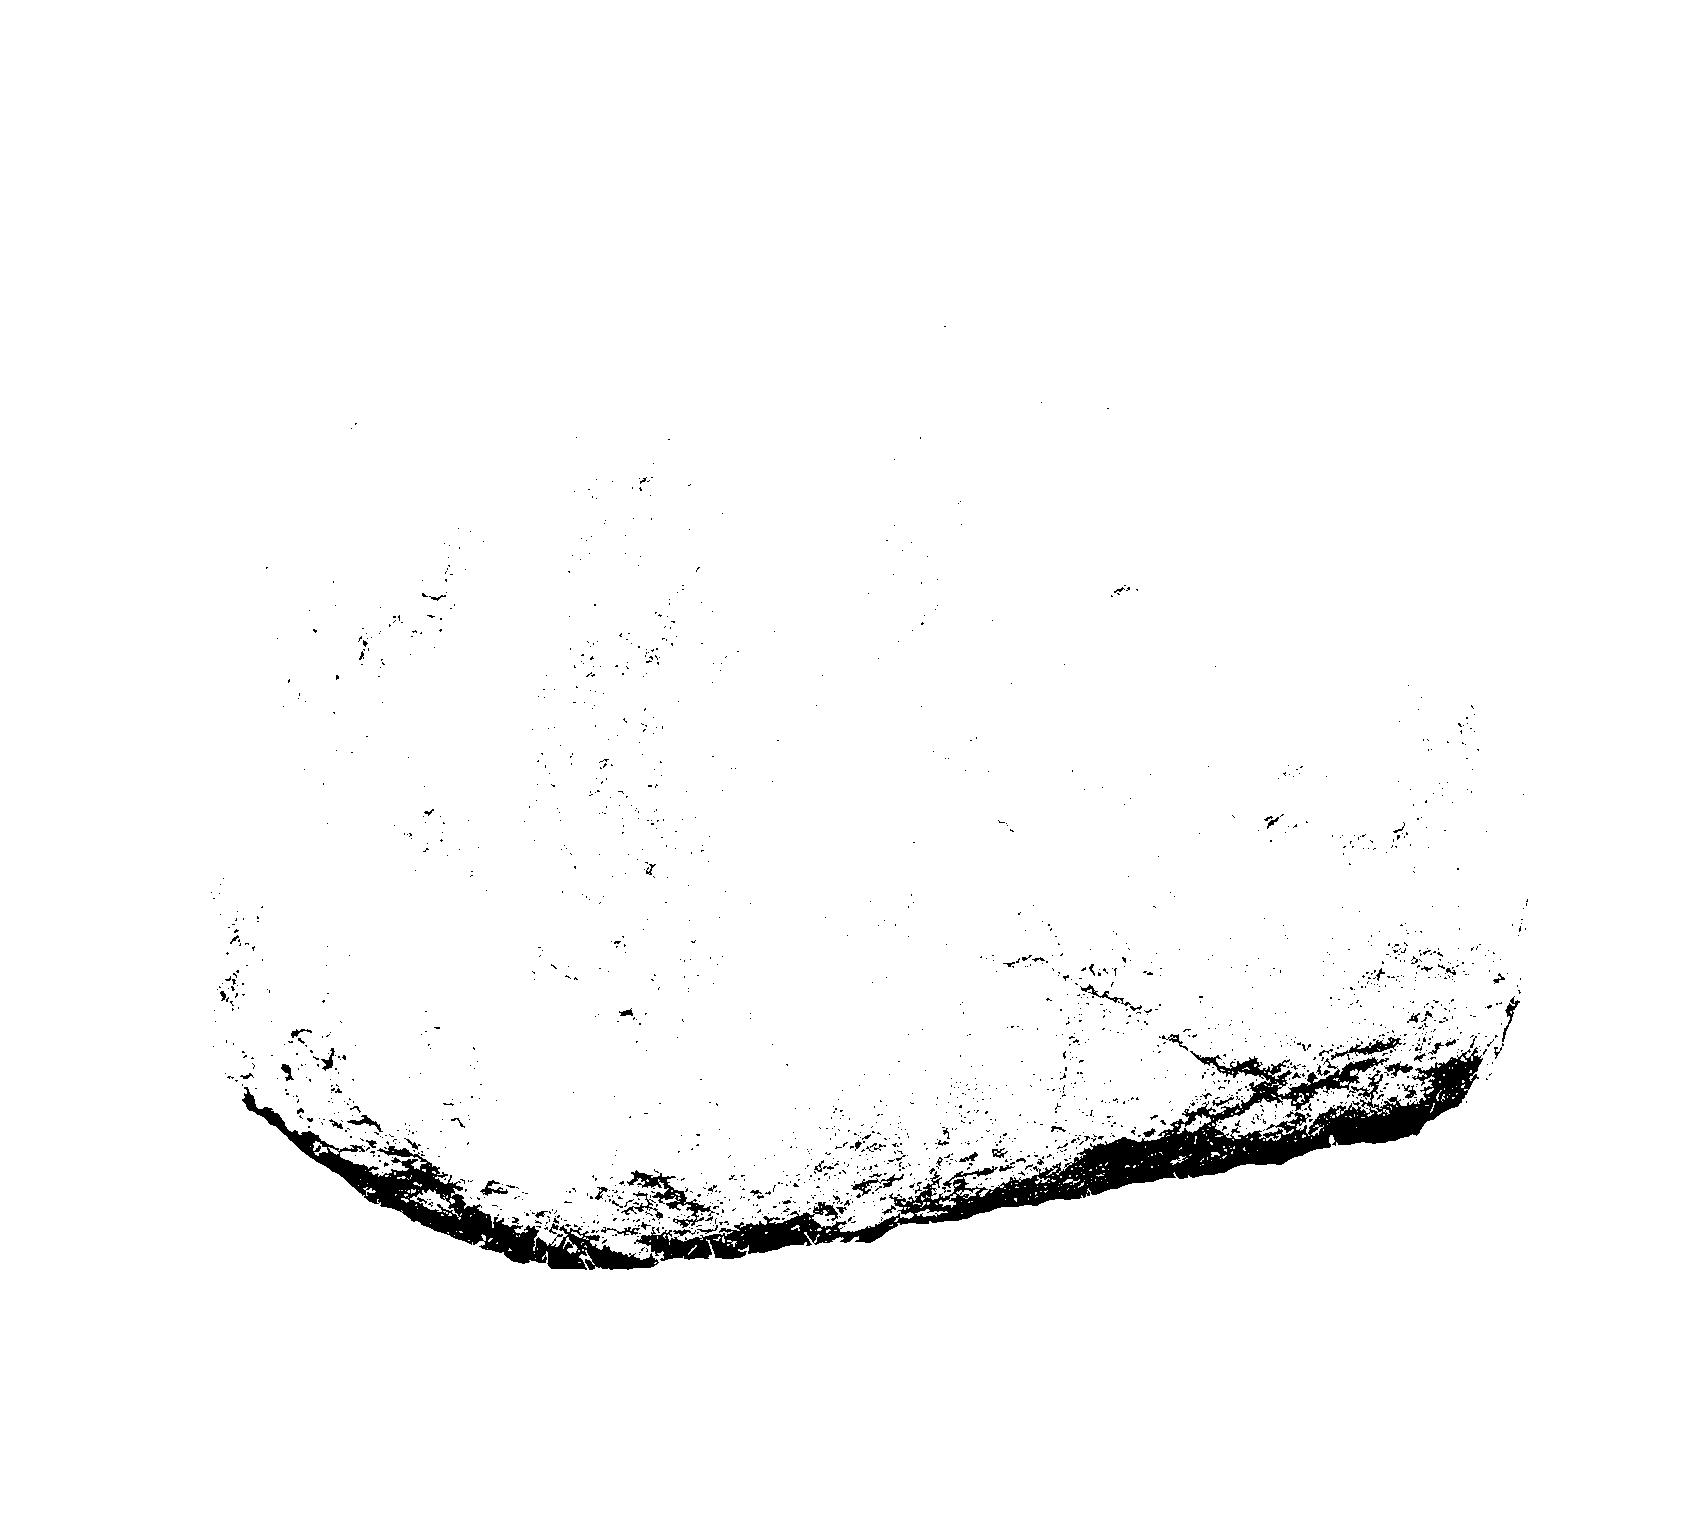 stone2-64.jpg